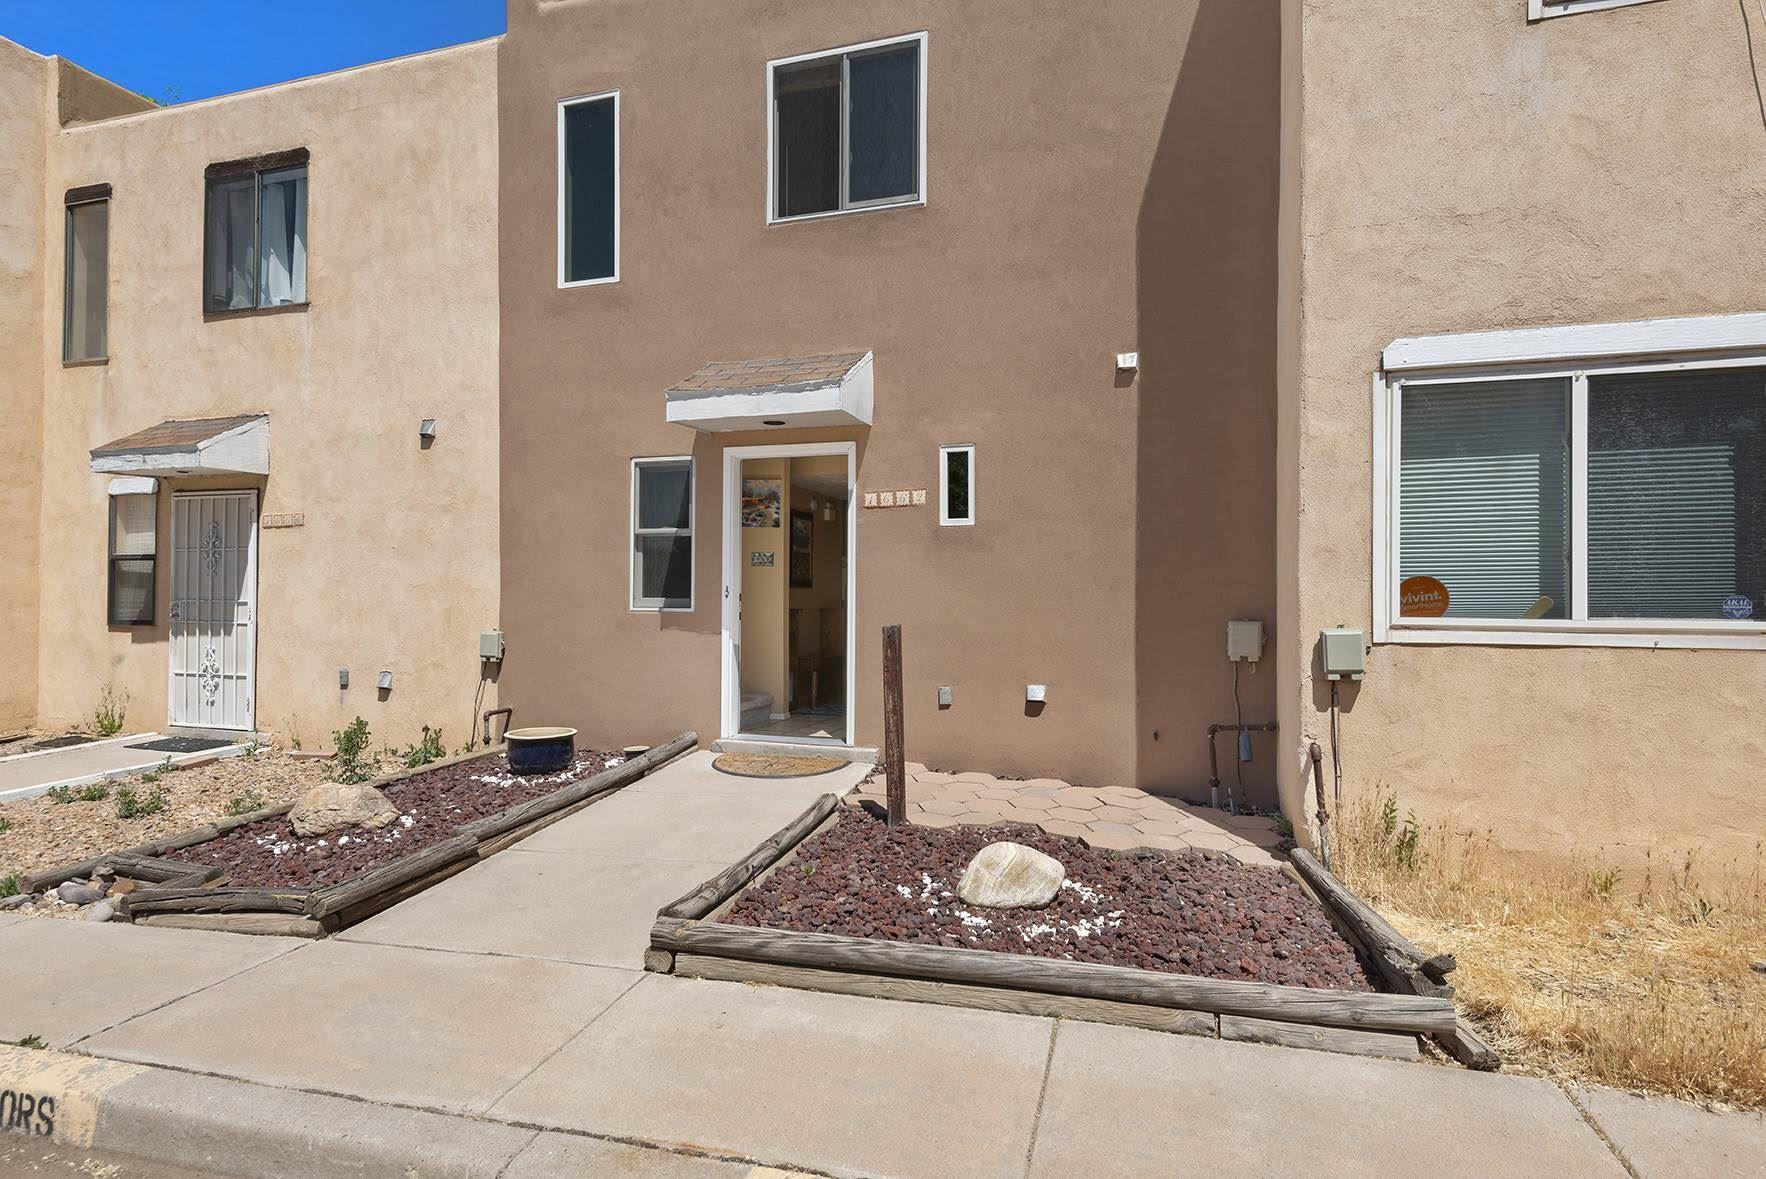 1662 Calle De Oriente Norte, Santa Fe, NM 87507 - #: 202001913